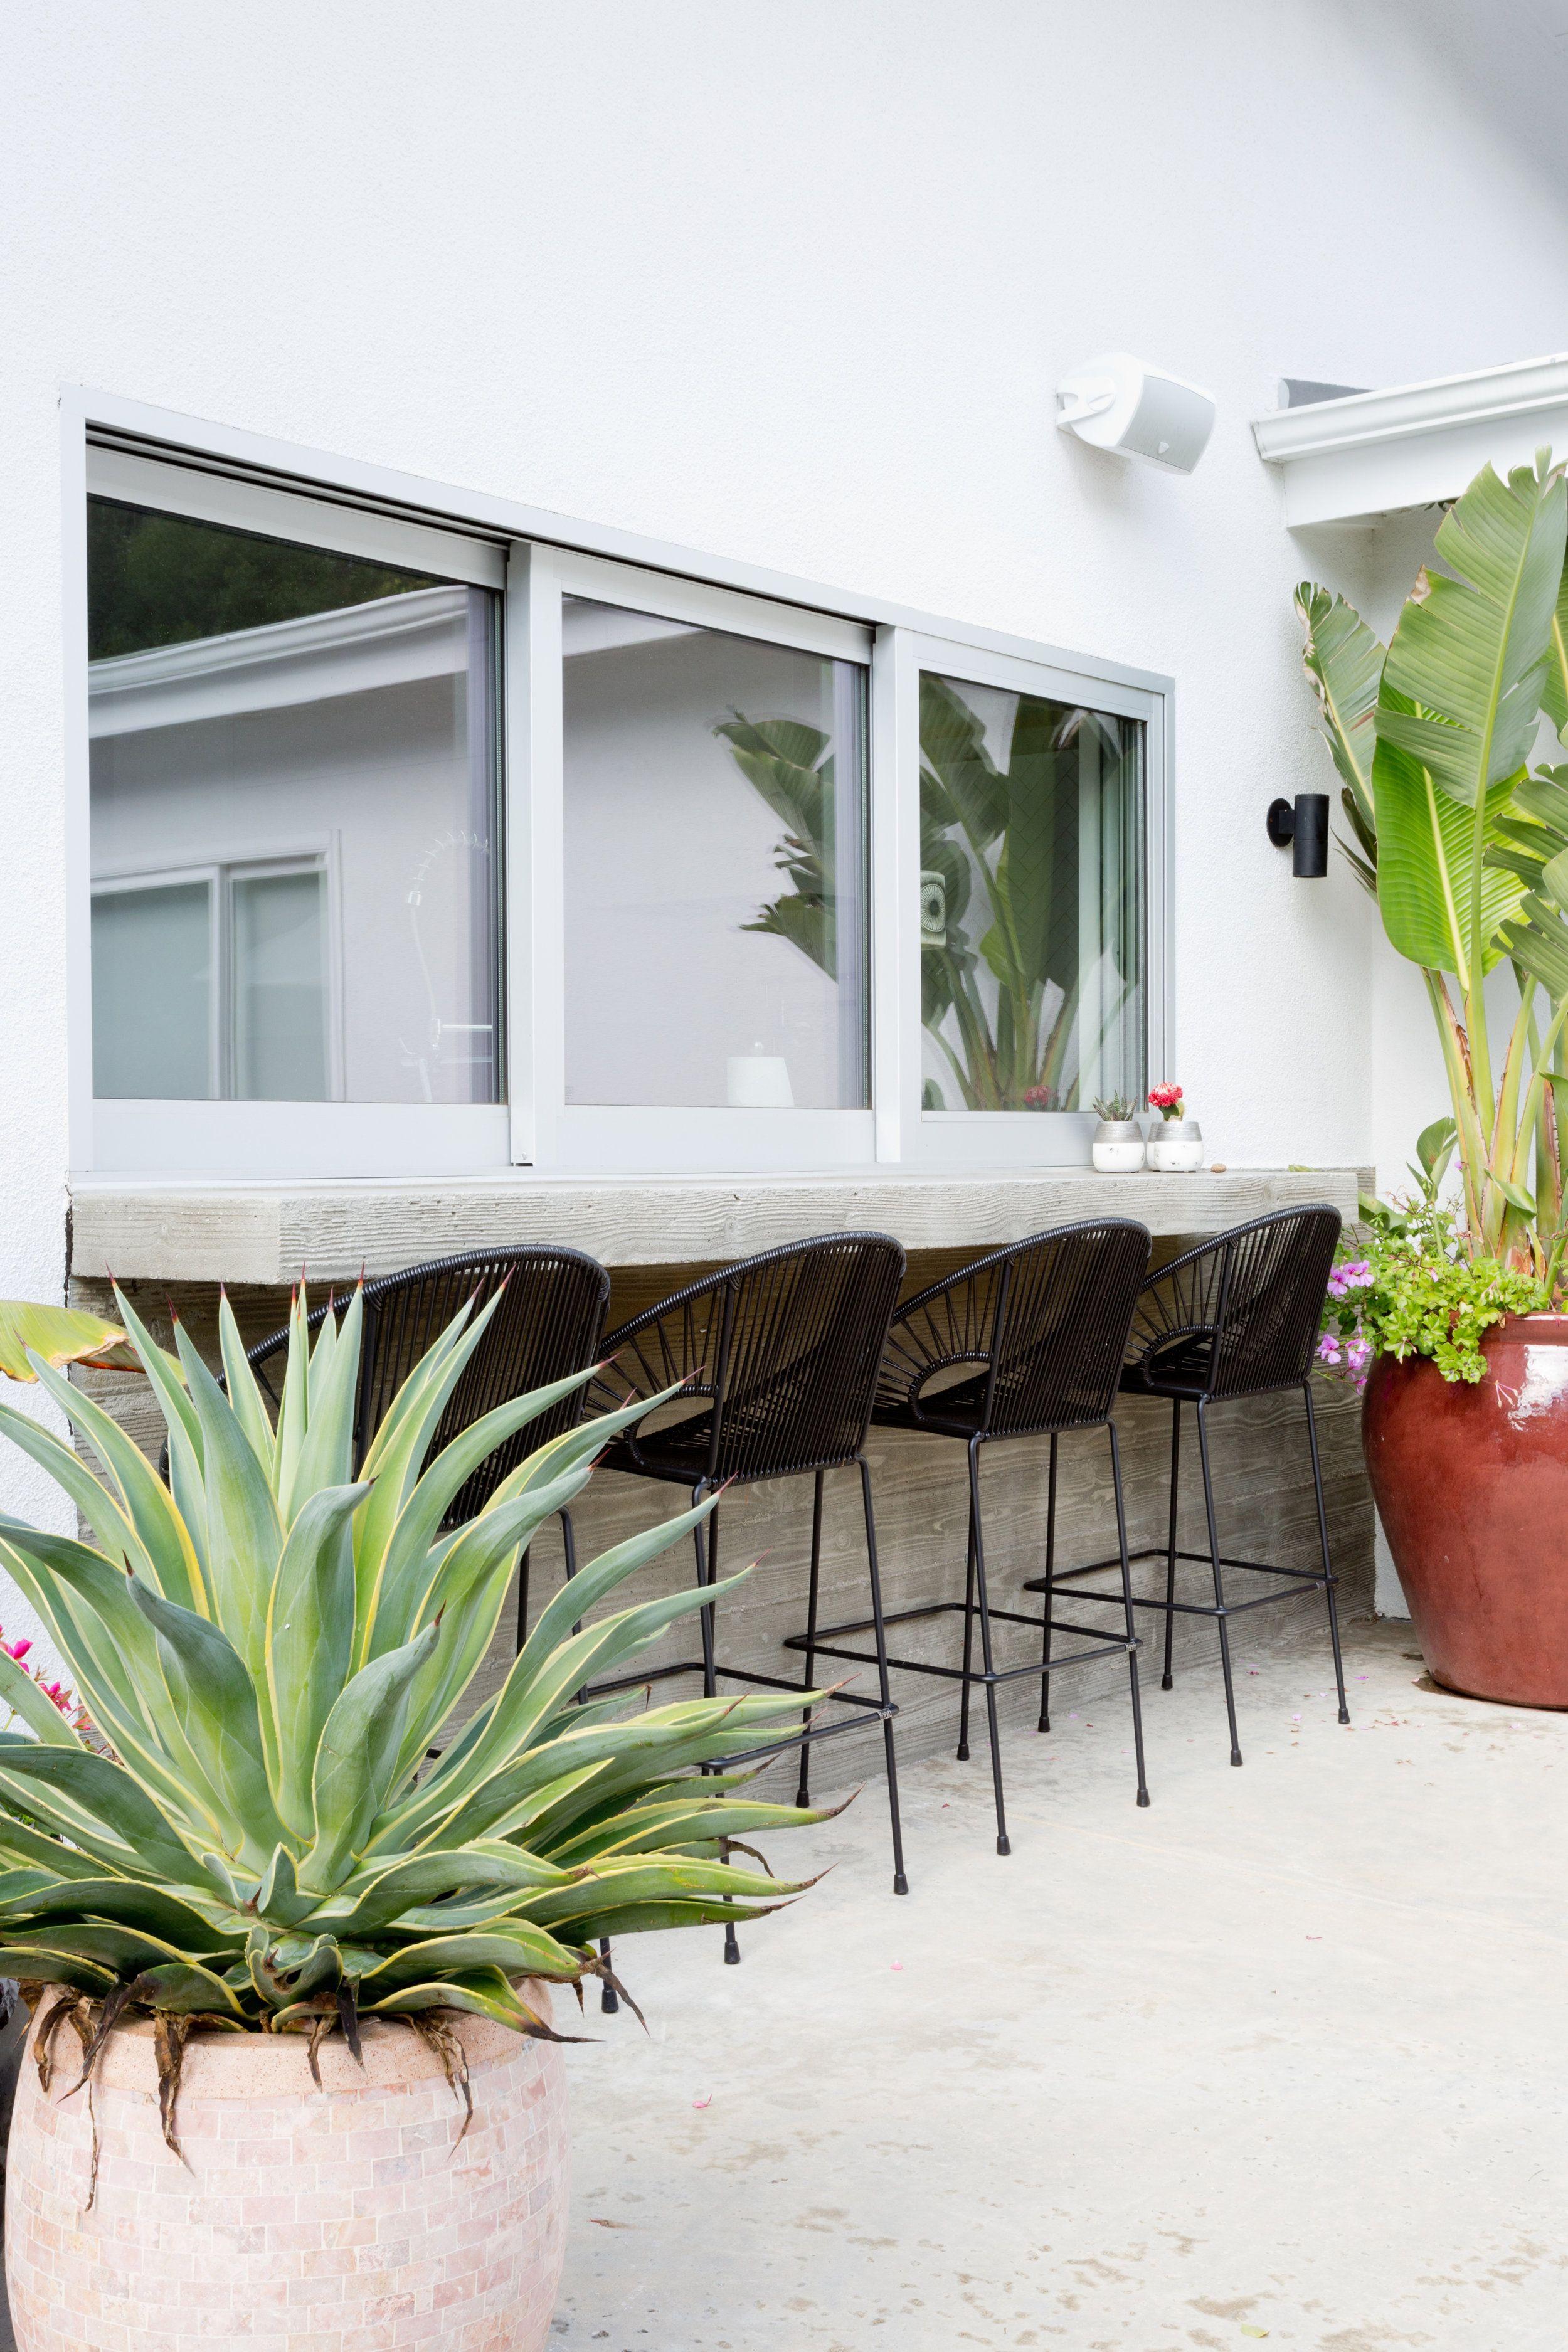 Pin by jasmine shen on exterior pinterest outdoor outdoor